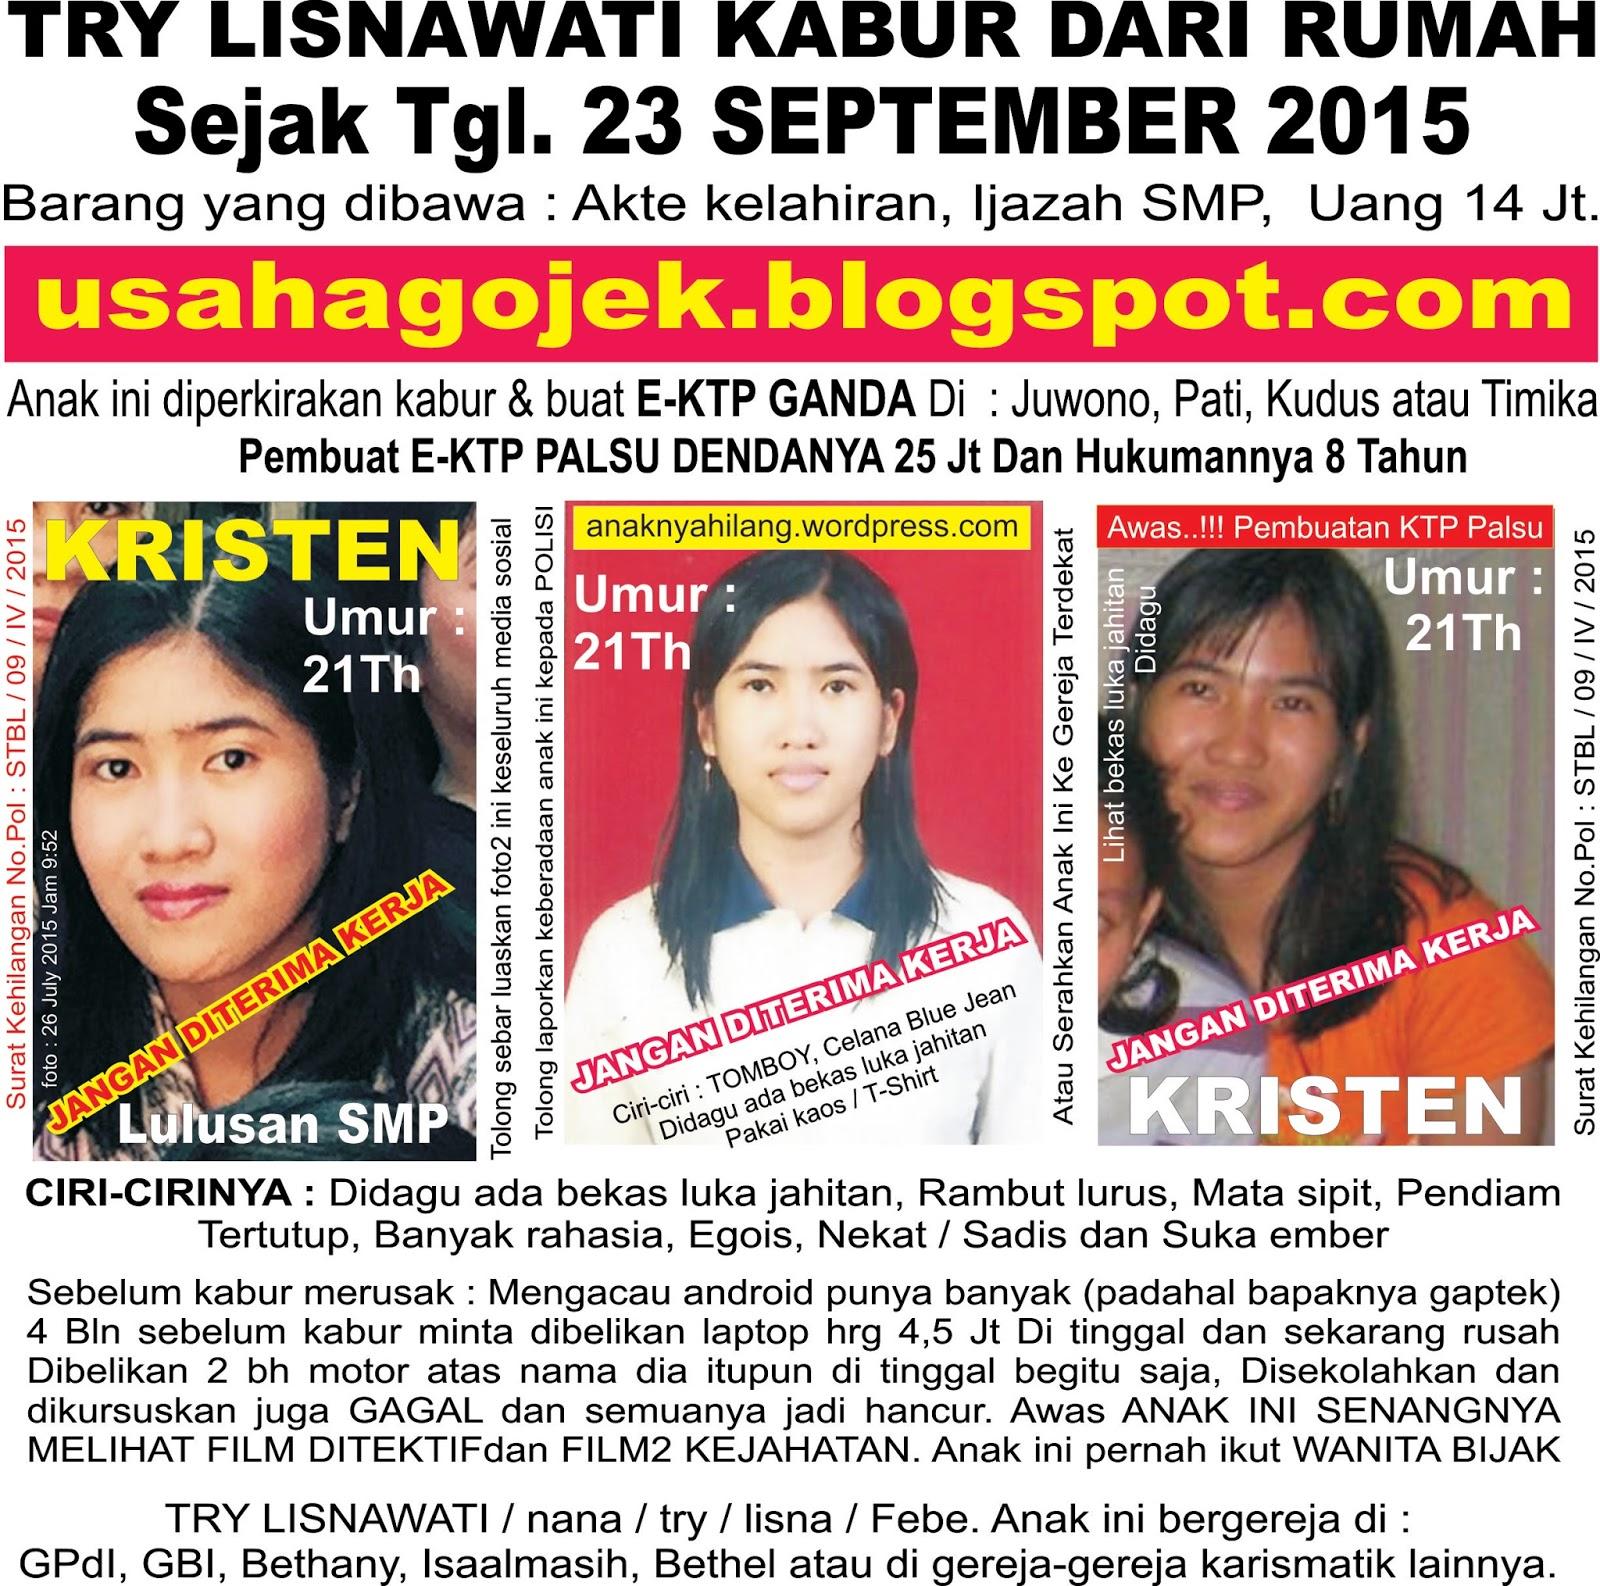 Jasa Desain Arsitek Mahasiswa Bandung: Tour And Travel, Jual Tiket Promo, Jasa Antar Jemput